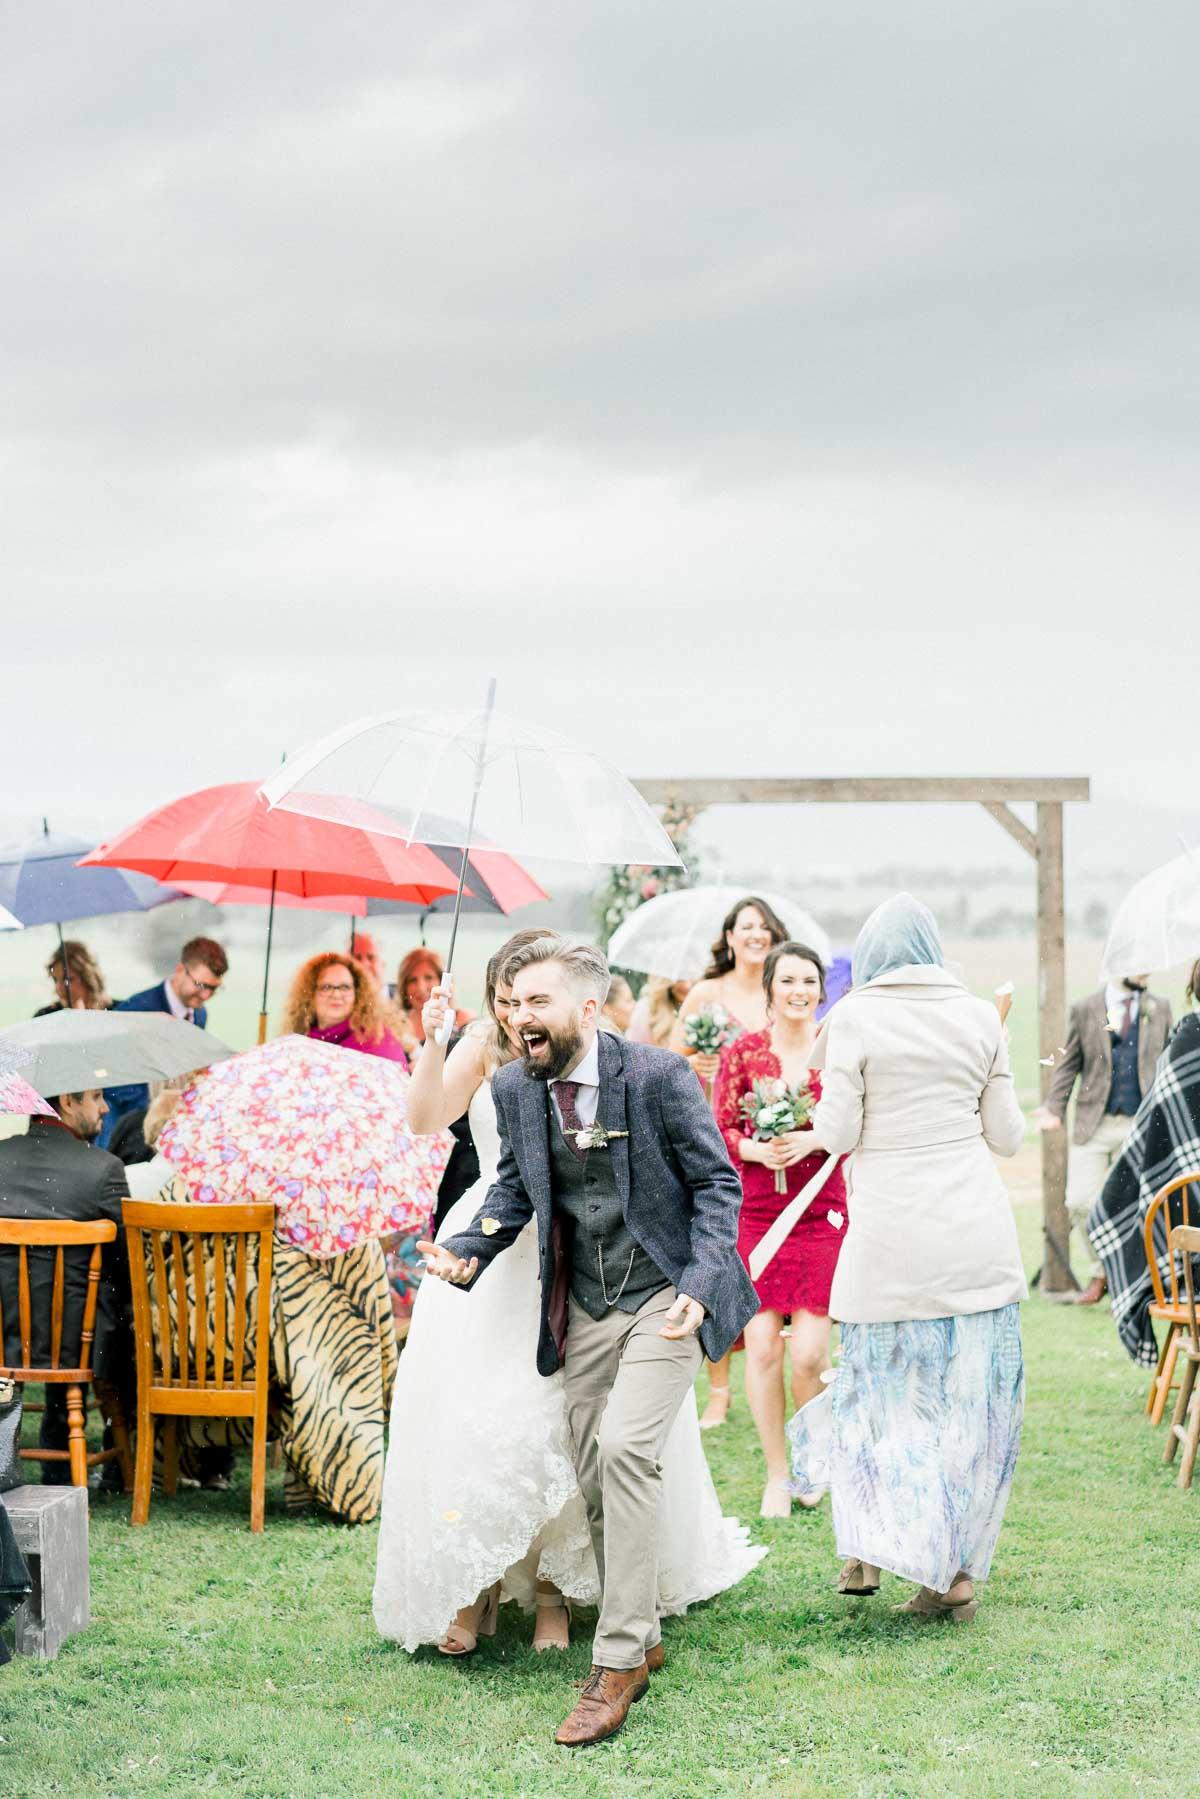 adams-farm-coldstream-yarra-valley-wedding-heart+soul-weddings-kel-jarryd-05144.jpg